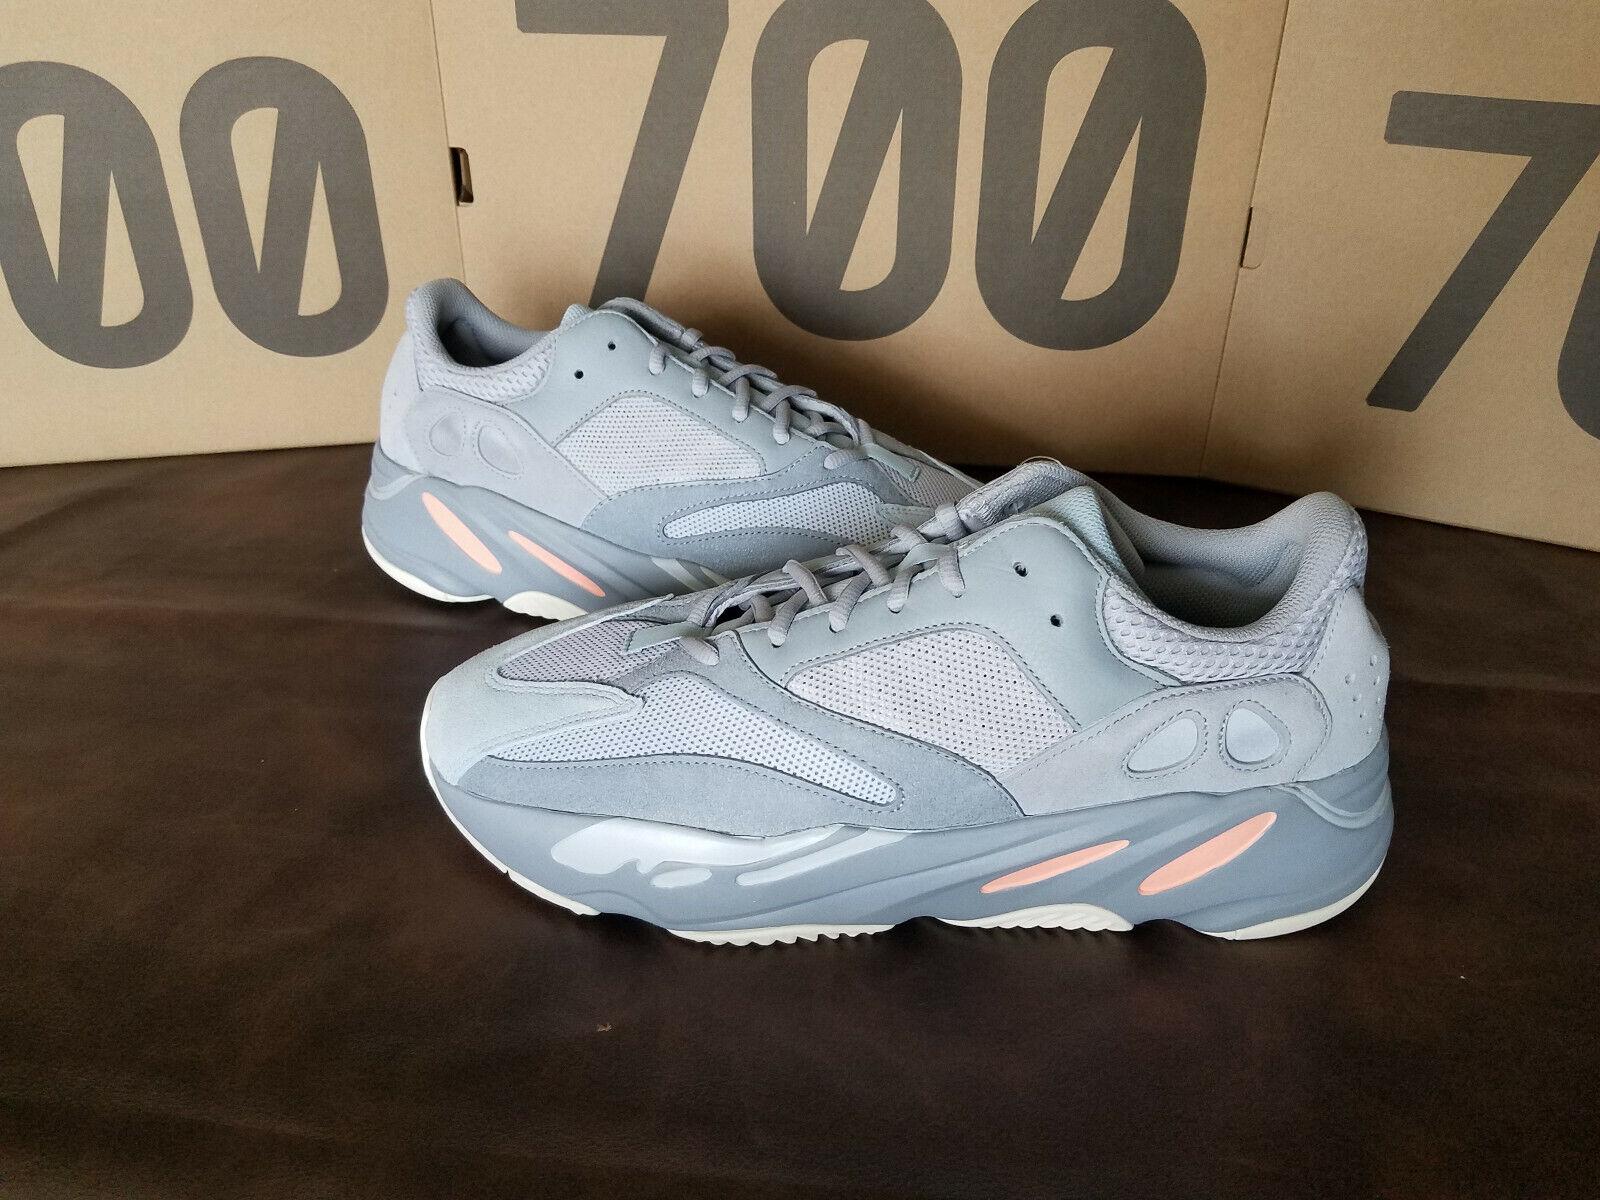 DS adidas Yeezy Boost 700 Inertia - EG7597 - Size 9